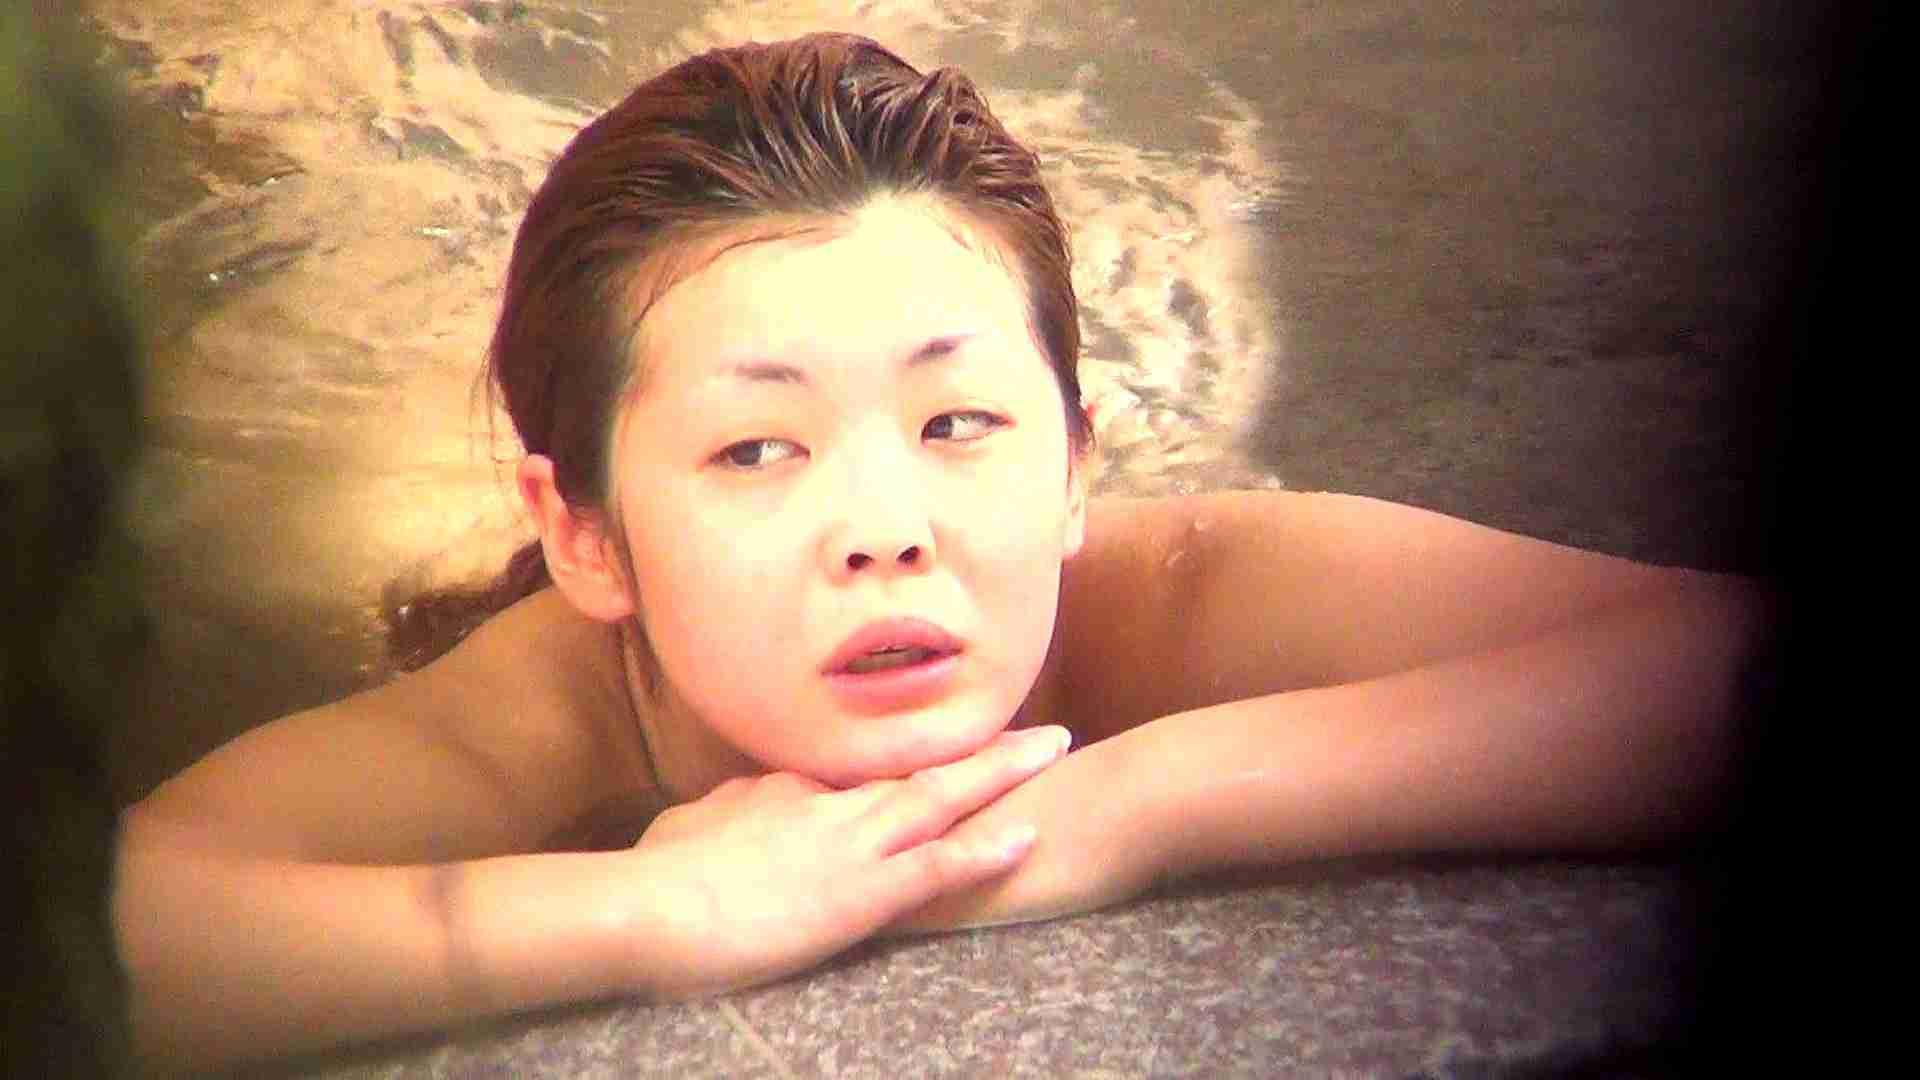 Aquaな露天風呂Vol.288 露天  85連発 67